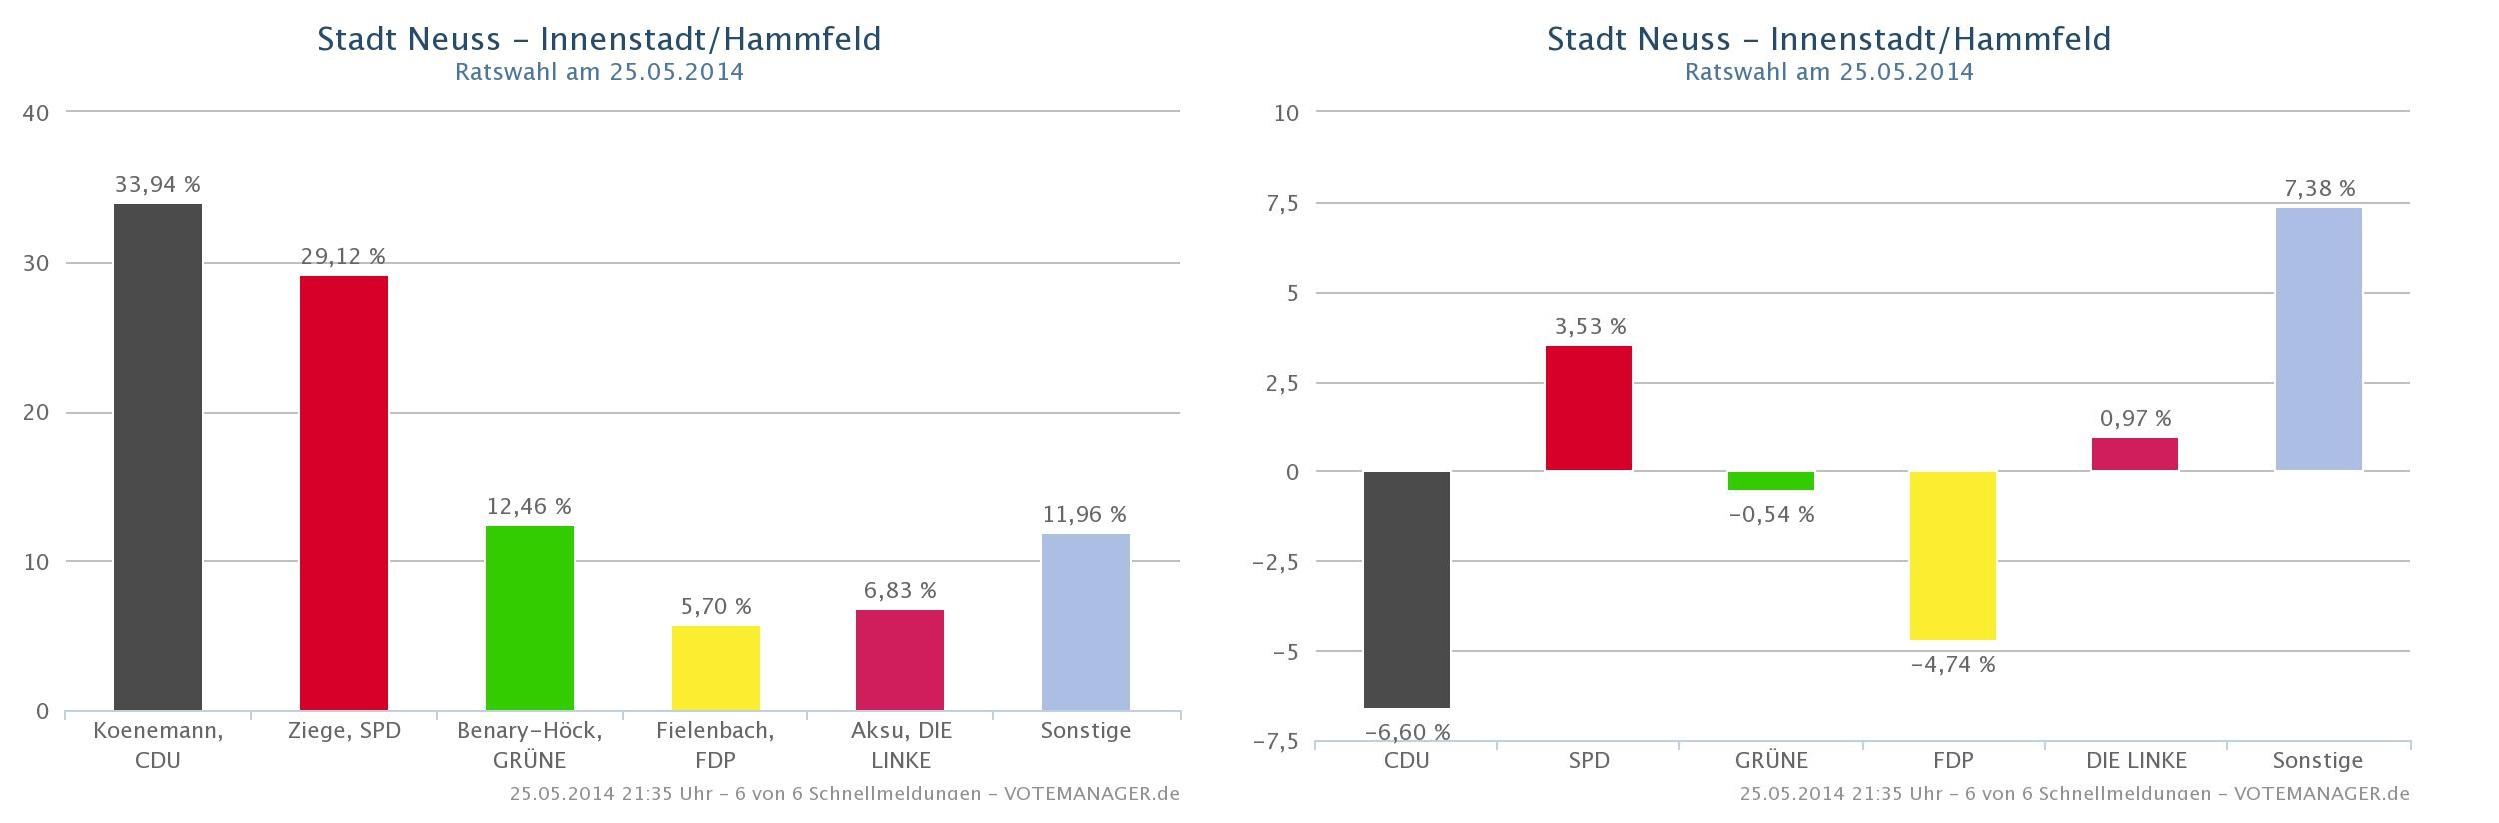 Ergebnis Innenstadt-Hammfeld